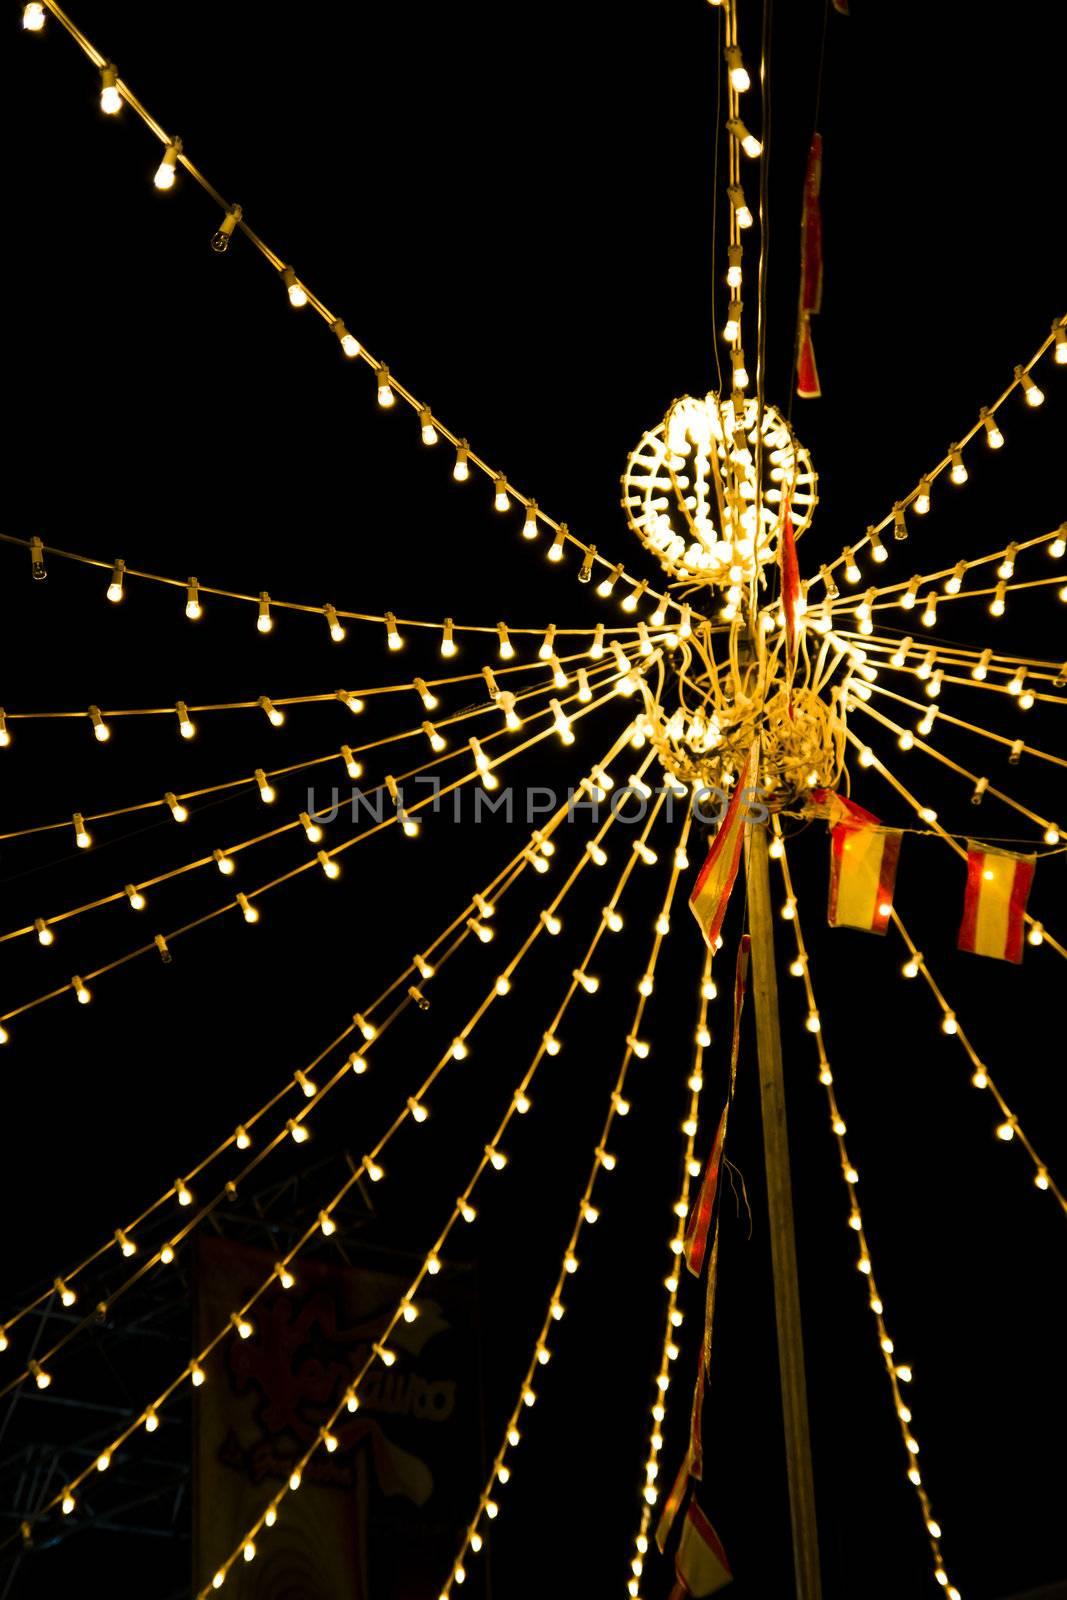 Lights festivities of Spain